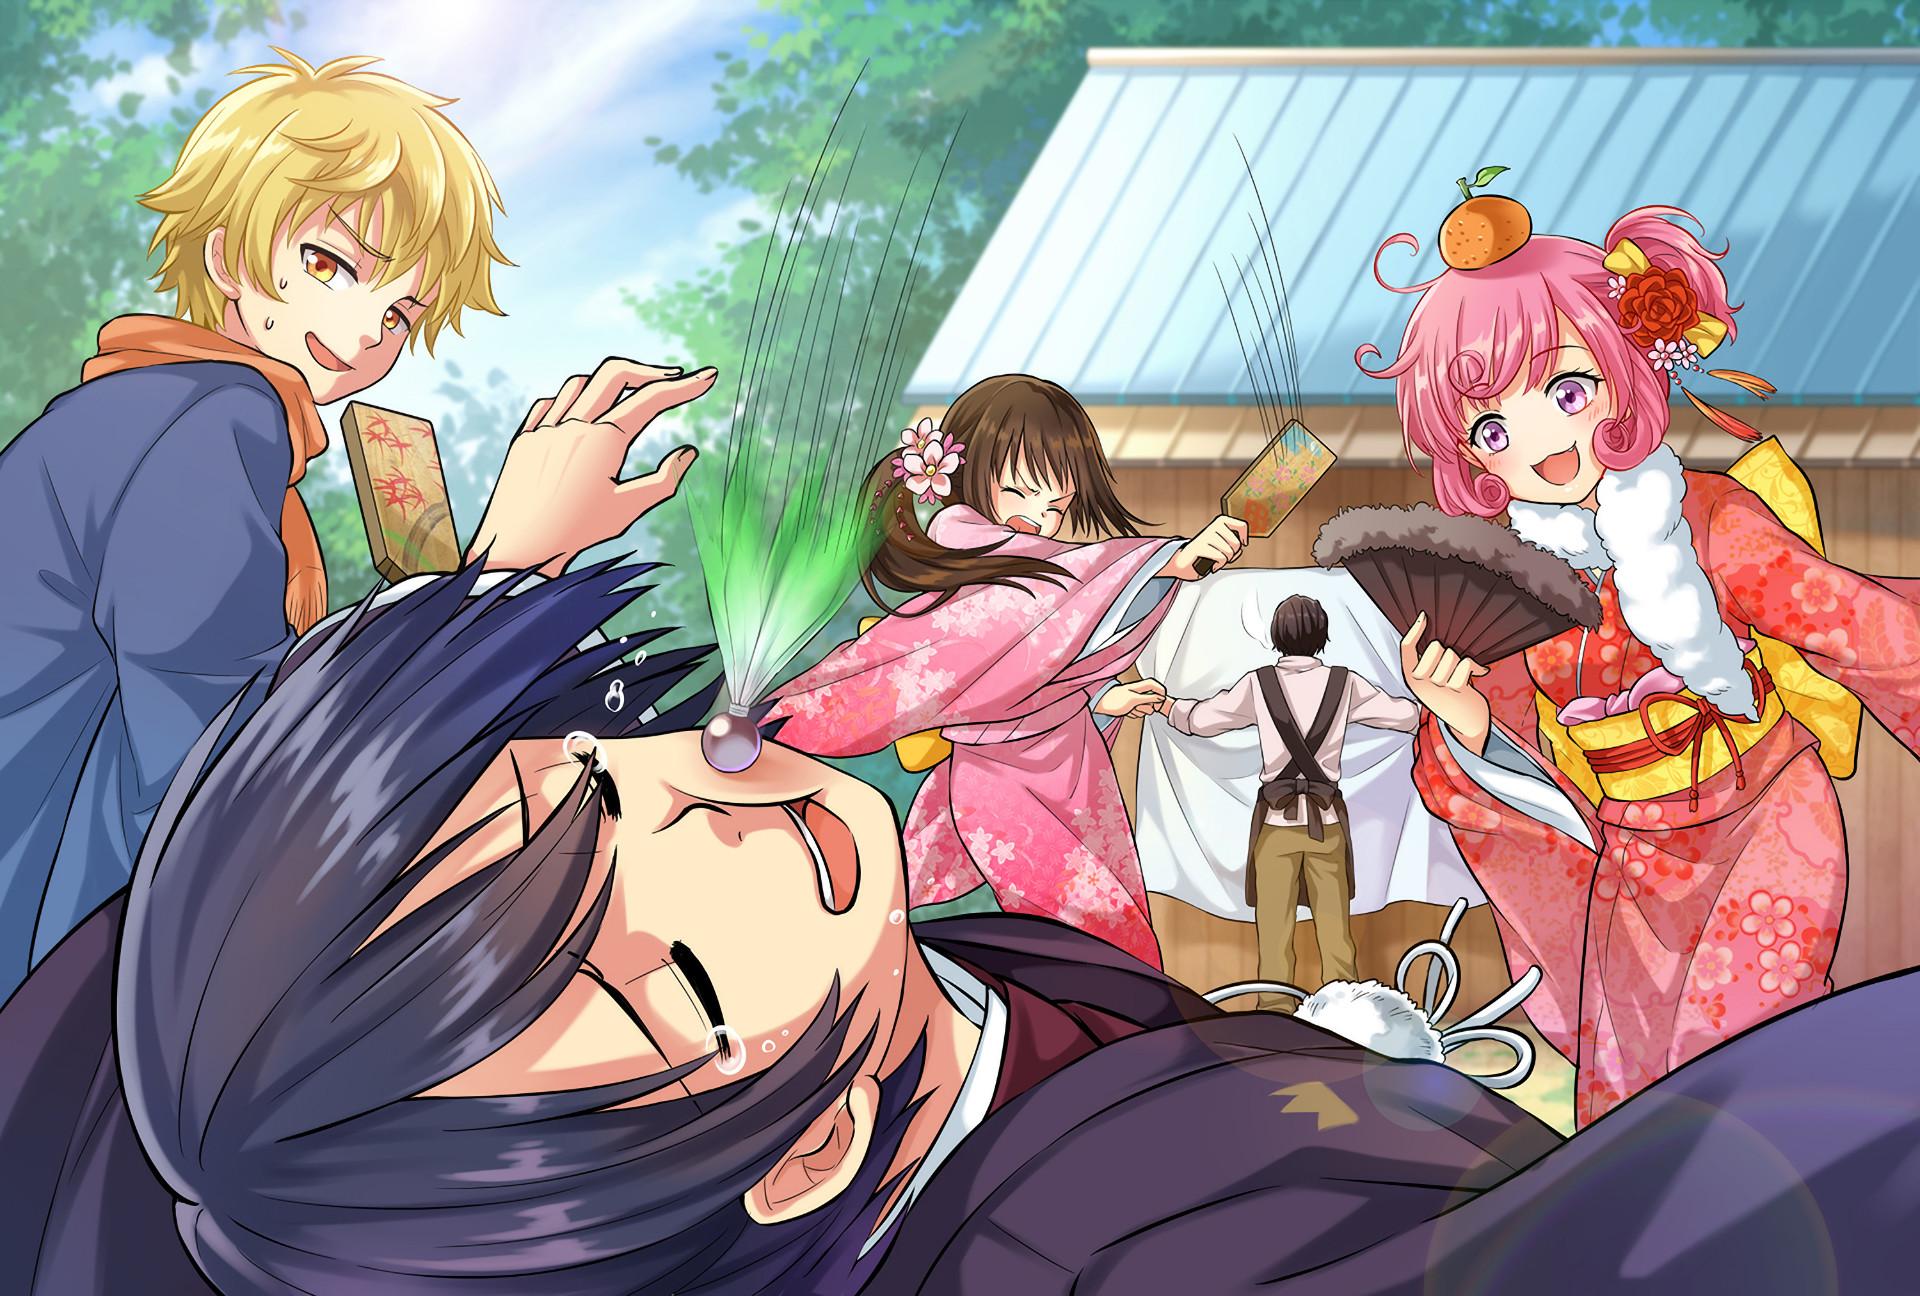 Fondo de pantalla HD   Fondo de Escritorio ID:701080. Anime  Noragami